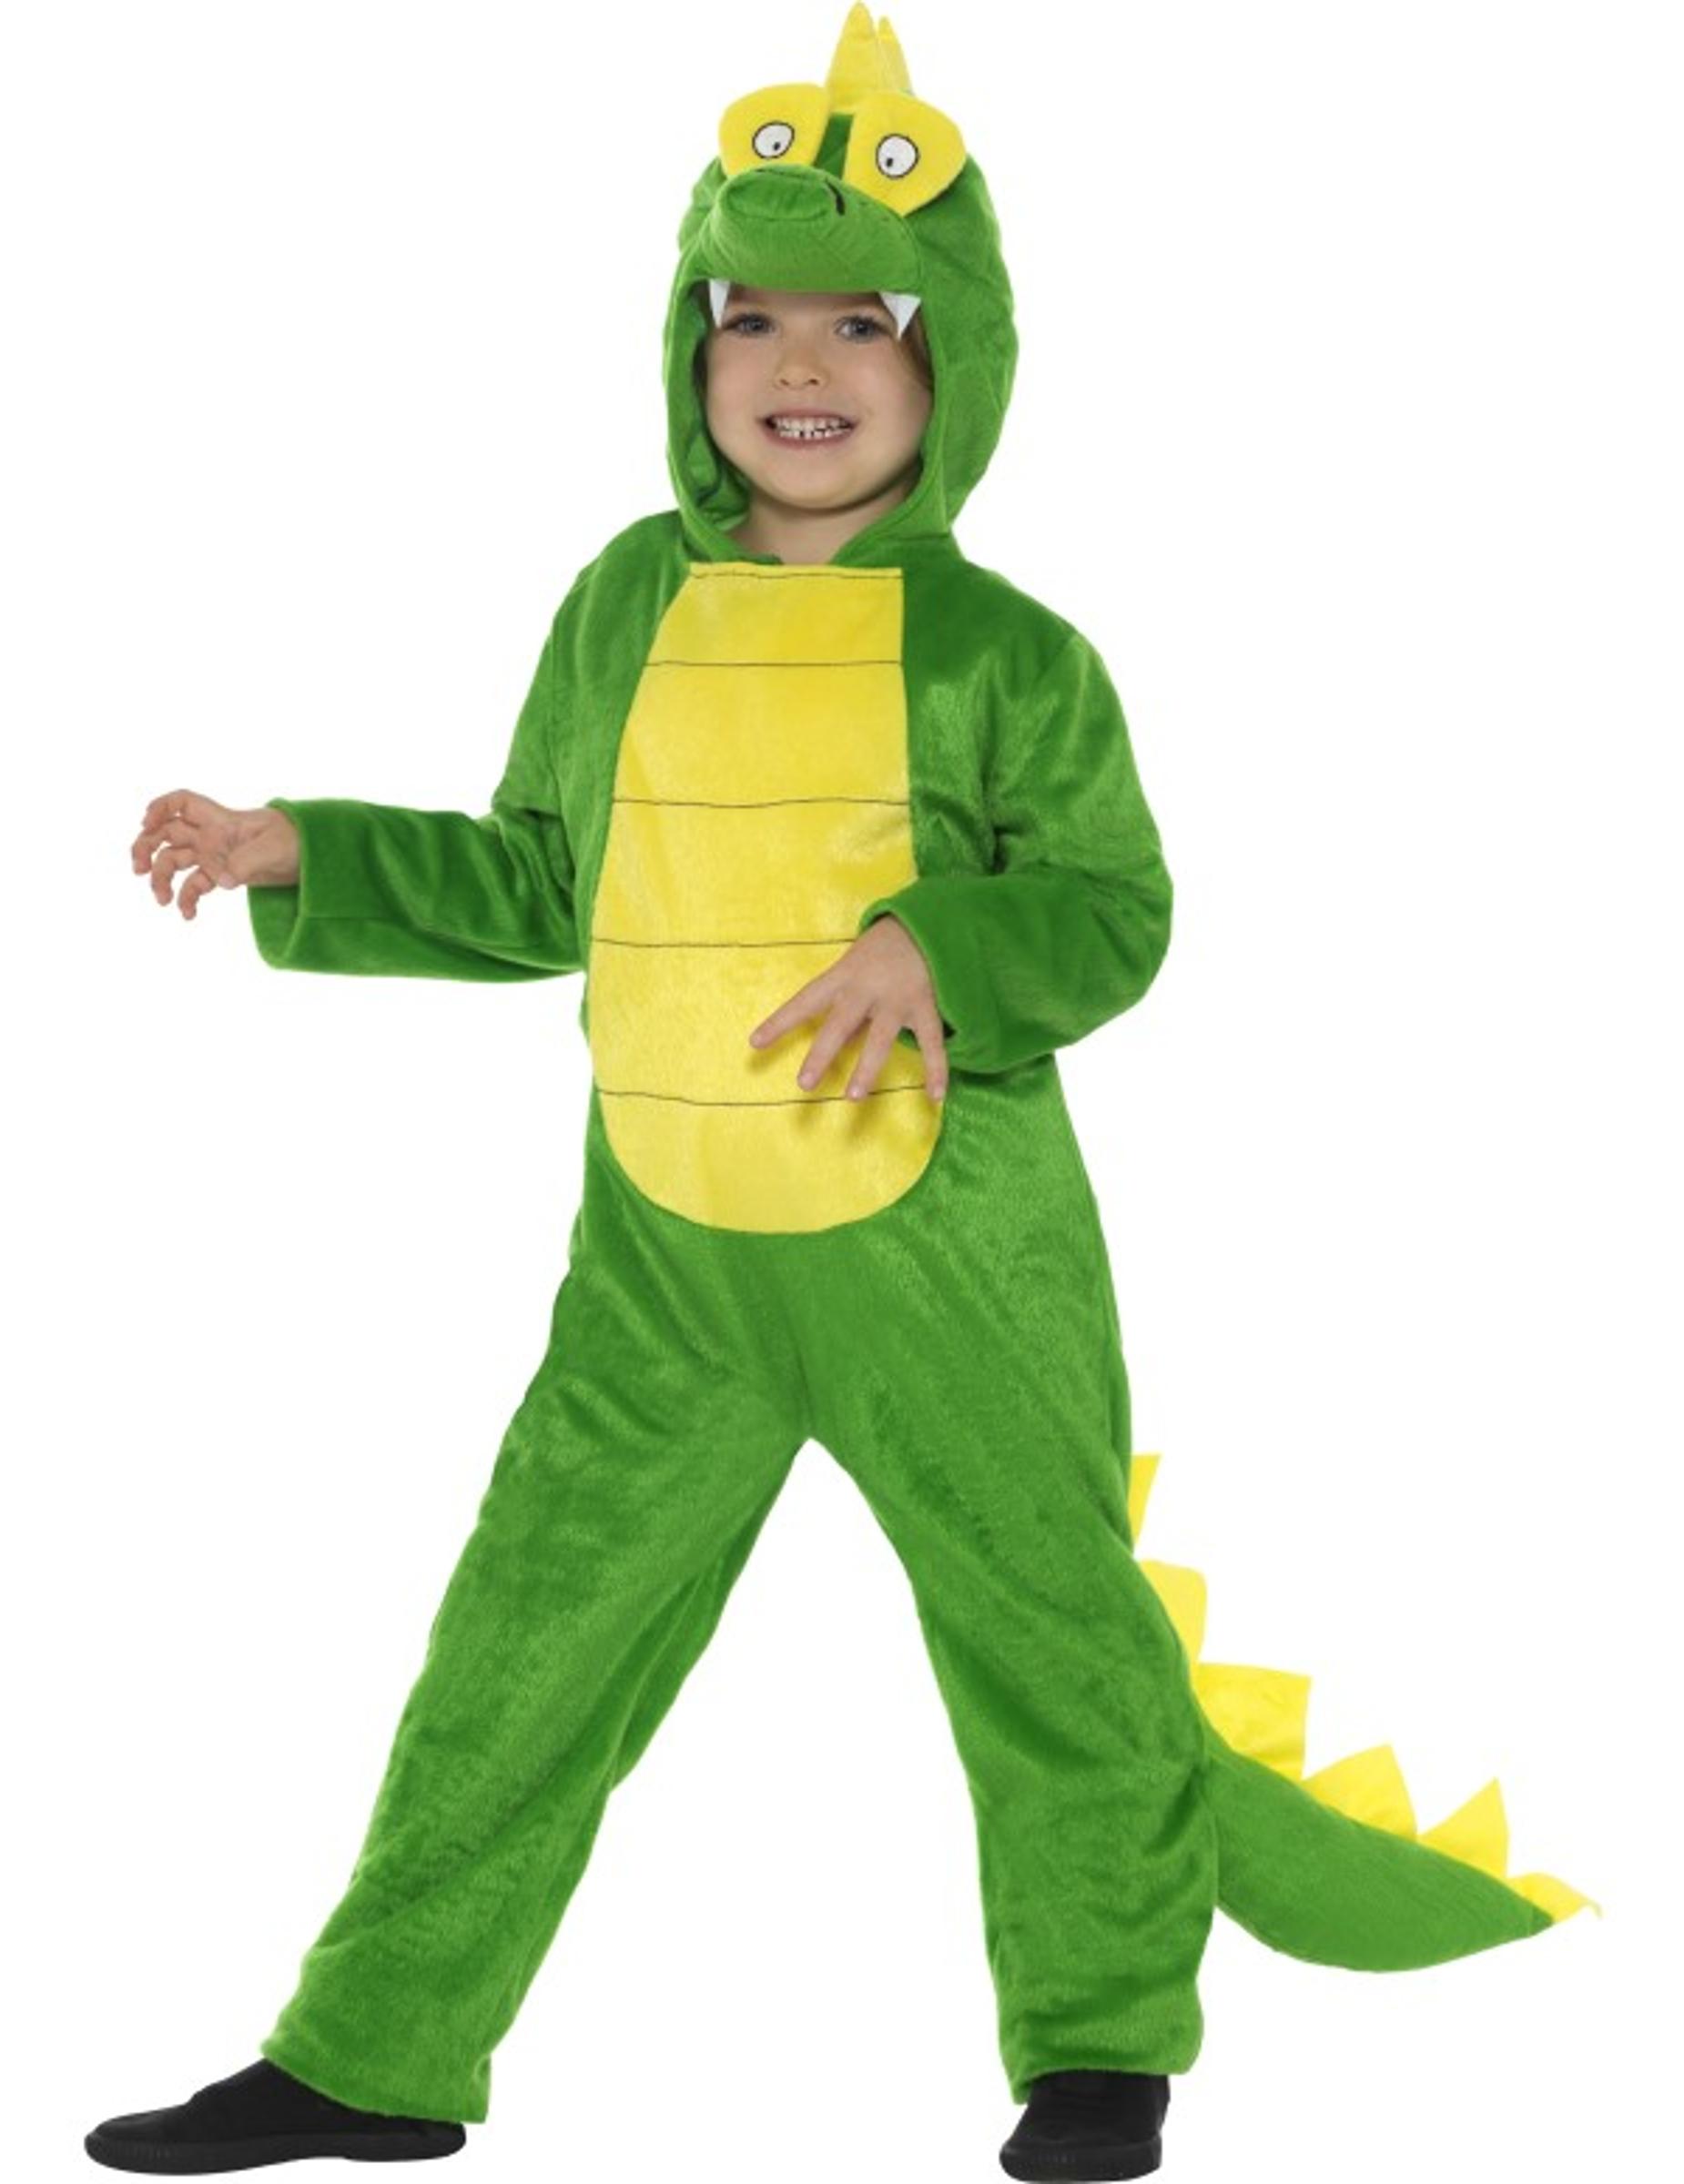 Drachen Kinderkostum Dinosaurier Grun Gelb Gunstige Faschings